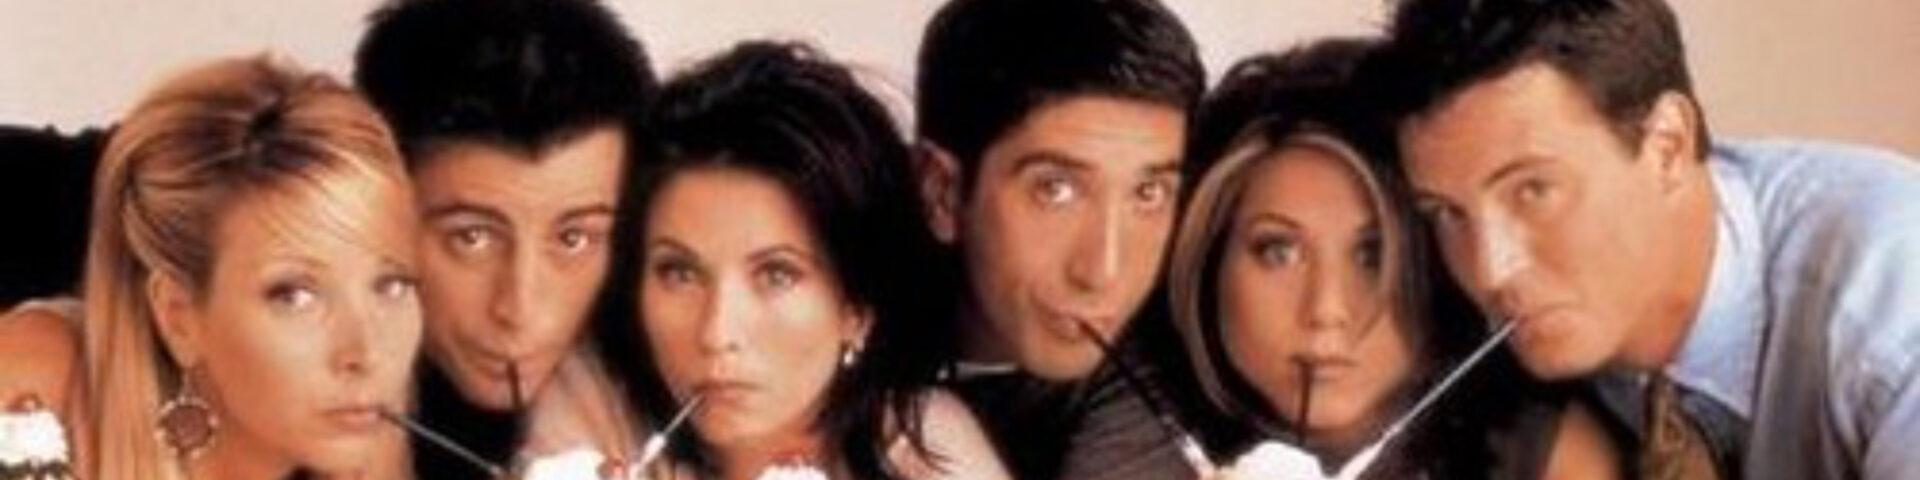 Friends Reunion: streaming in italiano?